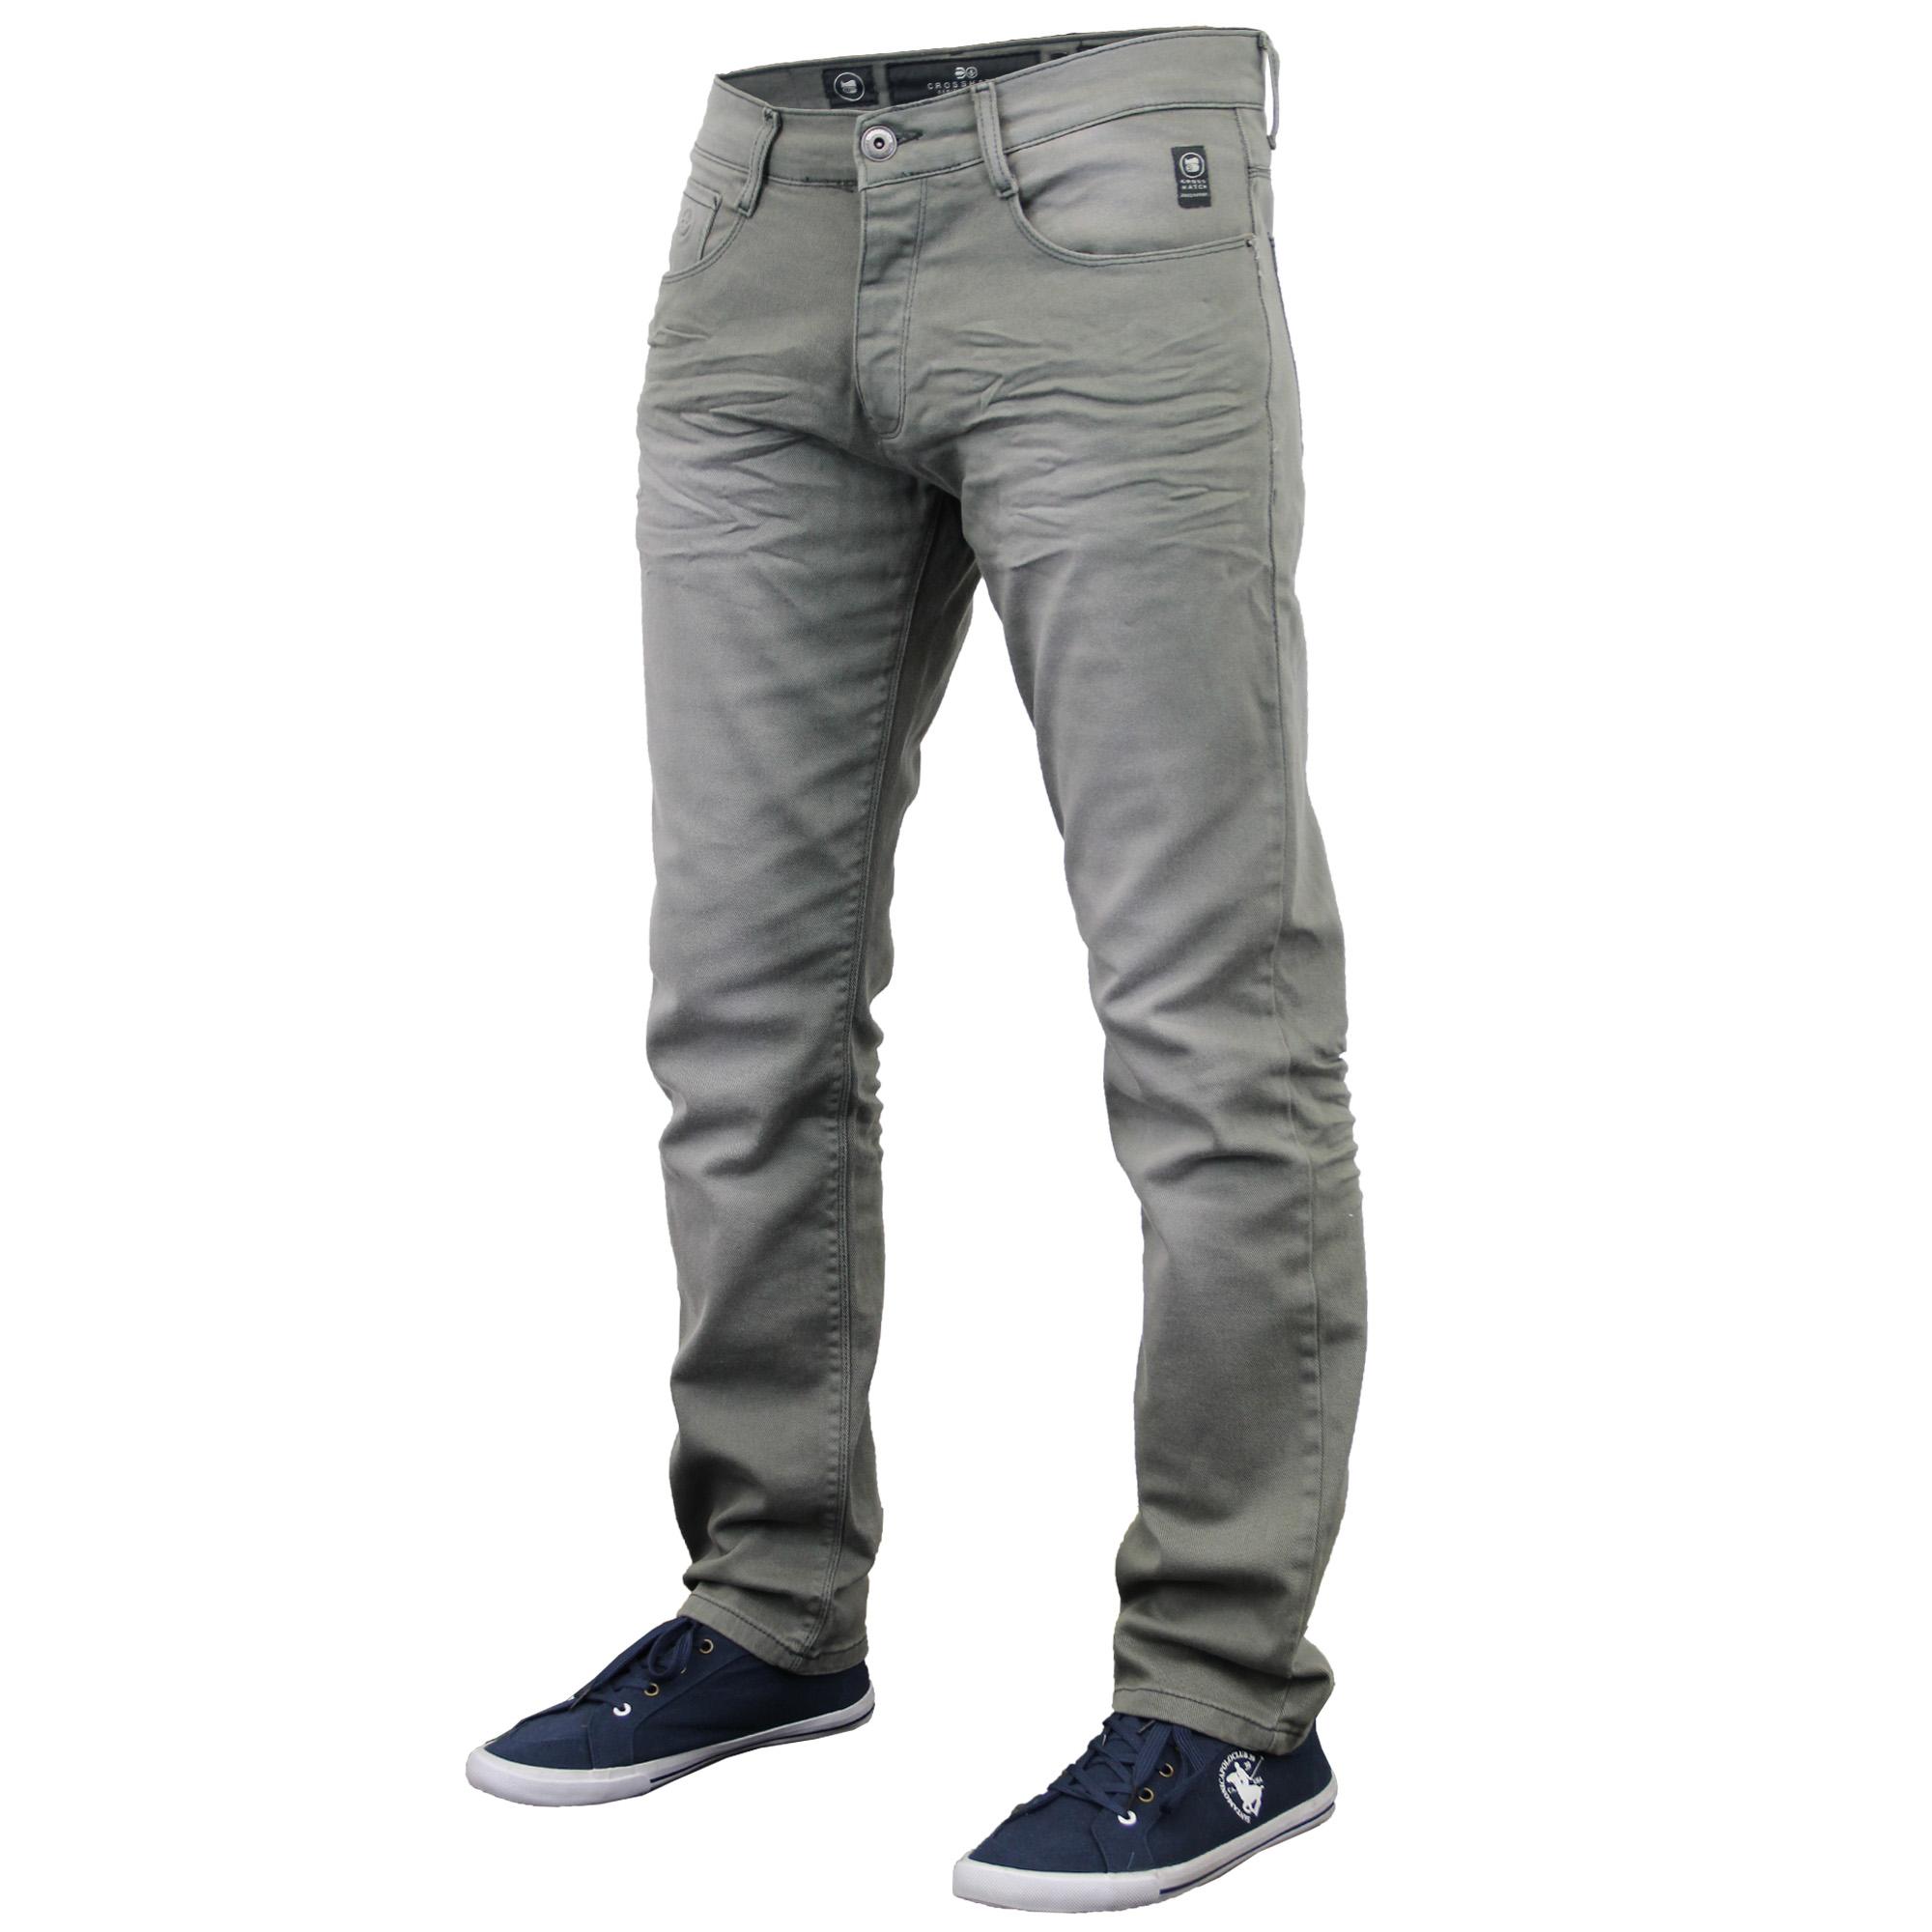 Mens Denim Jeans Crosshatch Pants Skinny Slim Fit Trouser Ruched ...